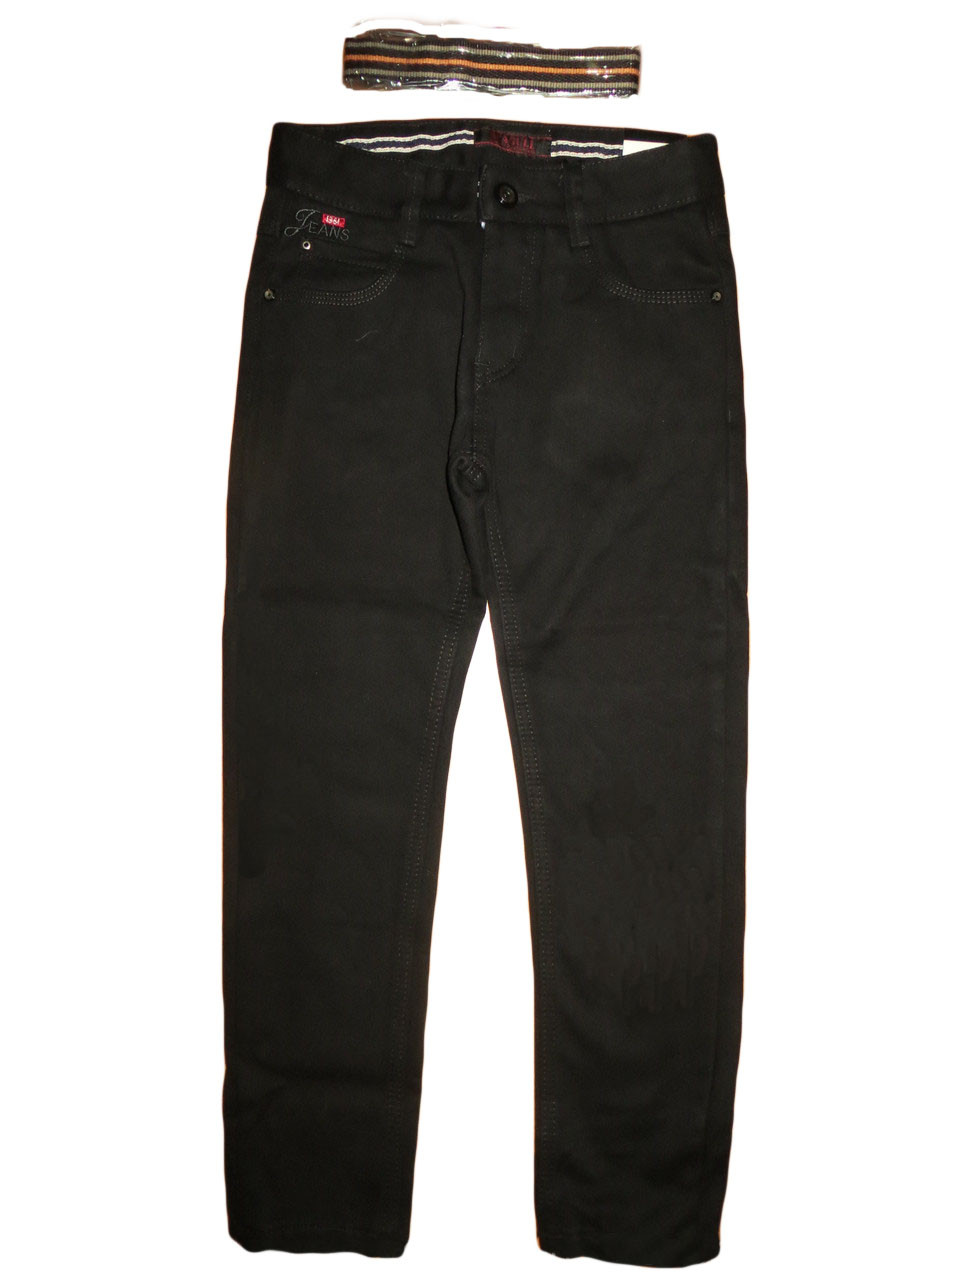 Утеплённые коттоновые брюки для мальчика, размеры 110. Seagull, арт. CSQ-88806